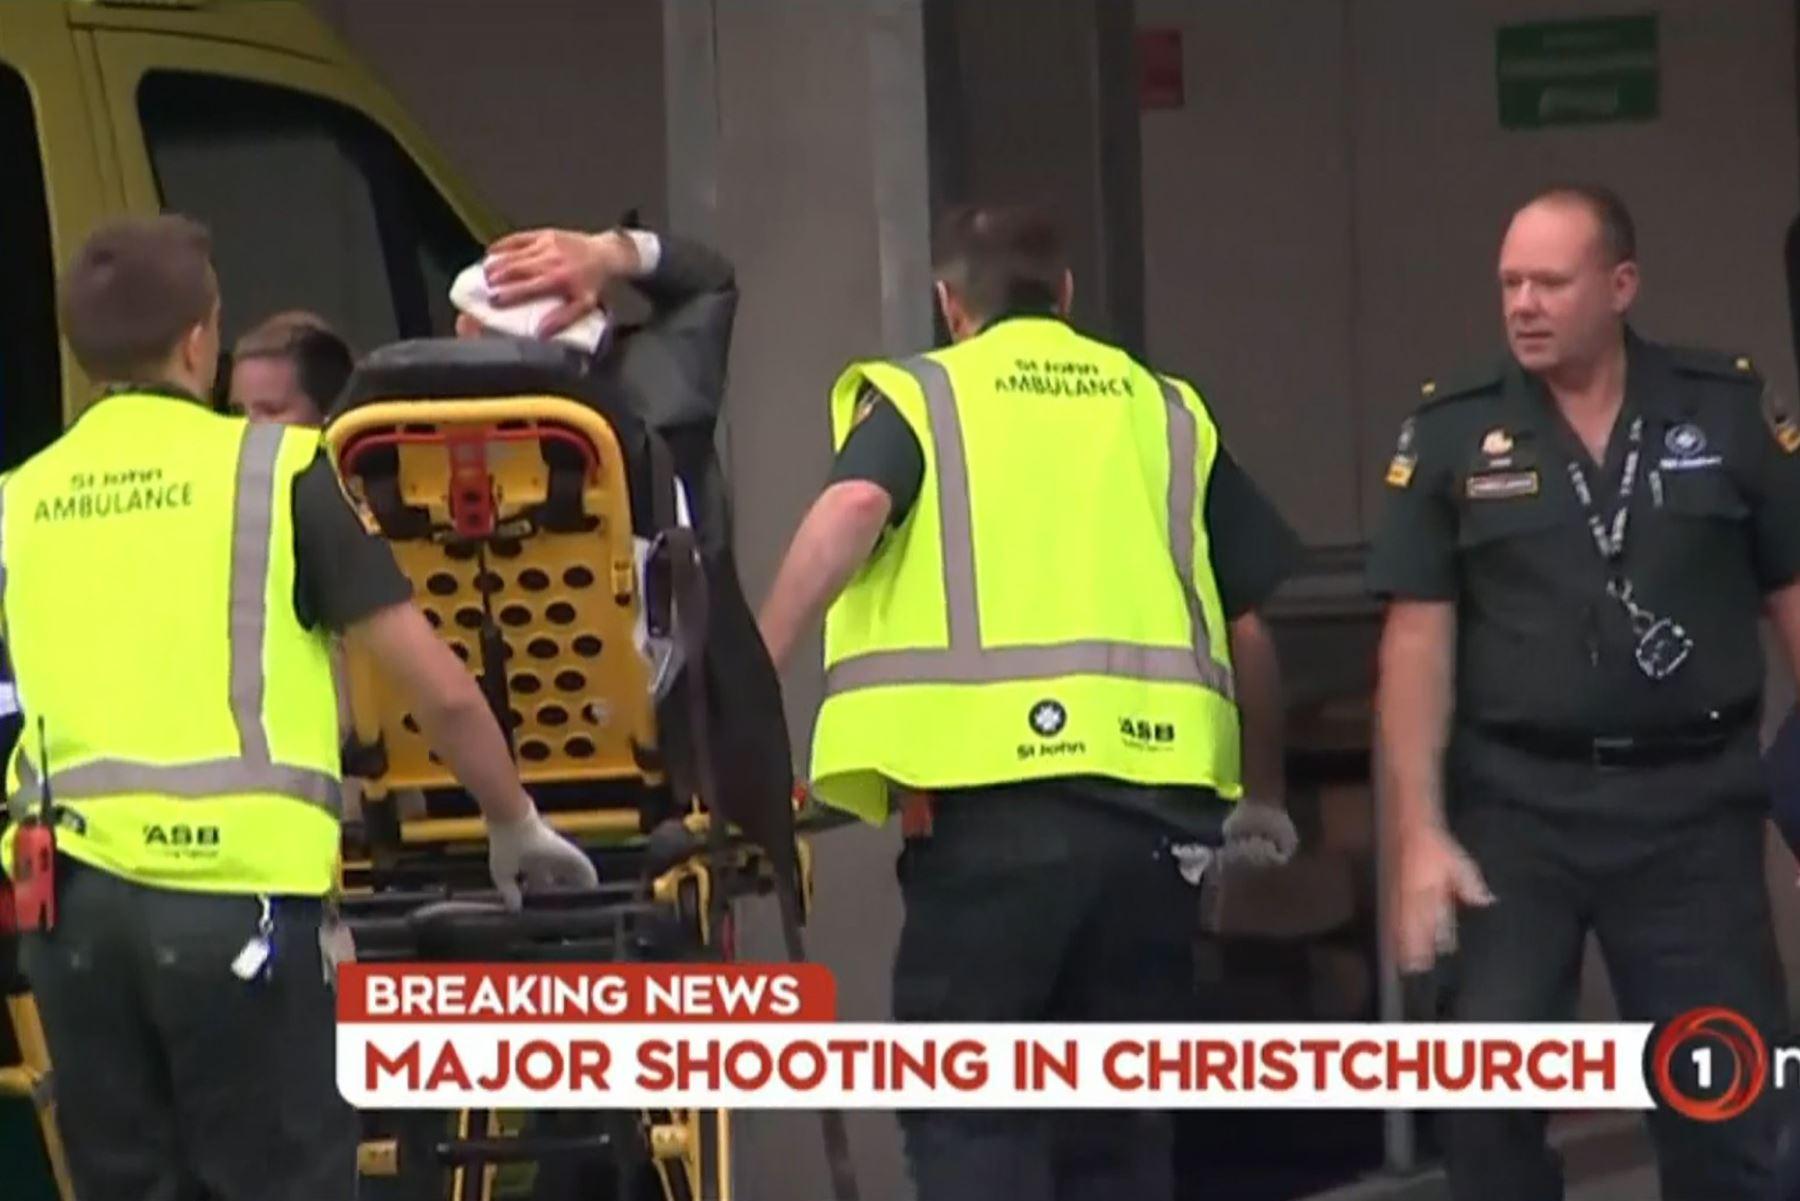 Captura de imagen de TV New Zealand tomada el 15 de marzo de 2019 muestra a una víctima sosteniendo su cabeza cuando llega a un hospital después del tiroteo en la mezquita de Christchurch. Foto: AFP